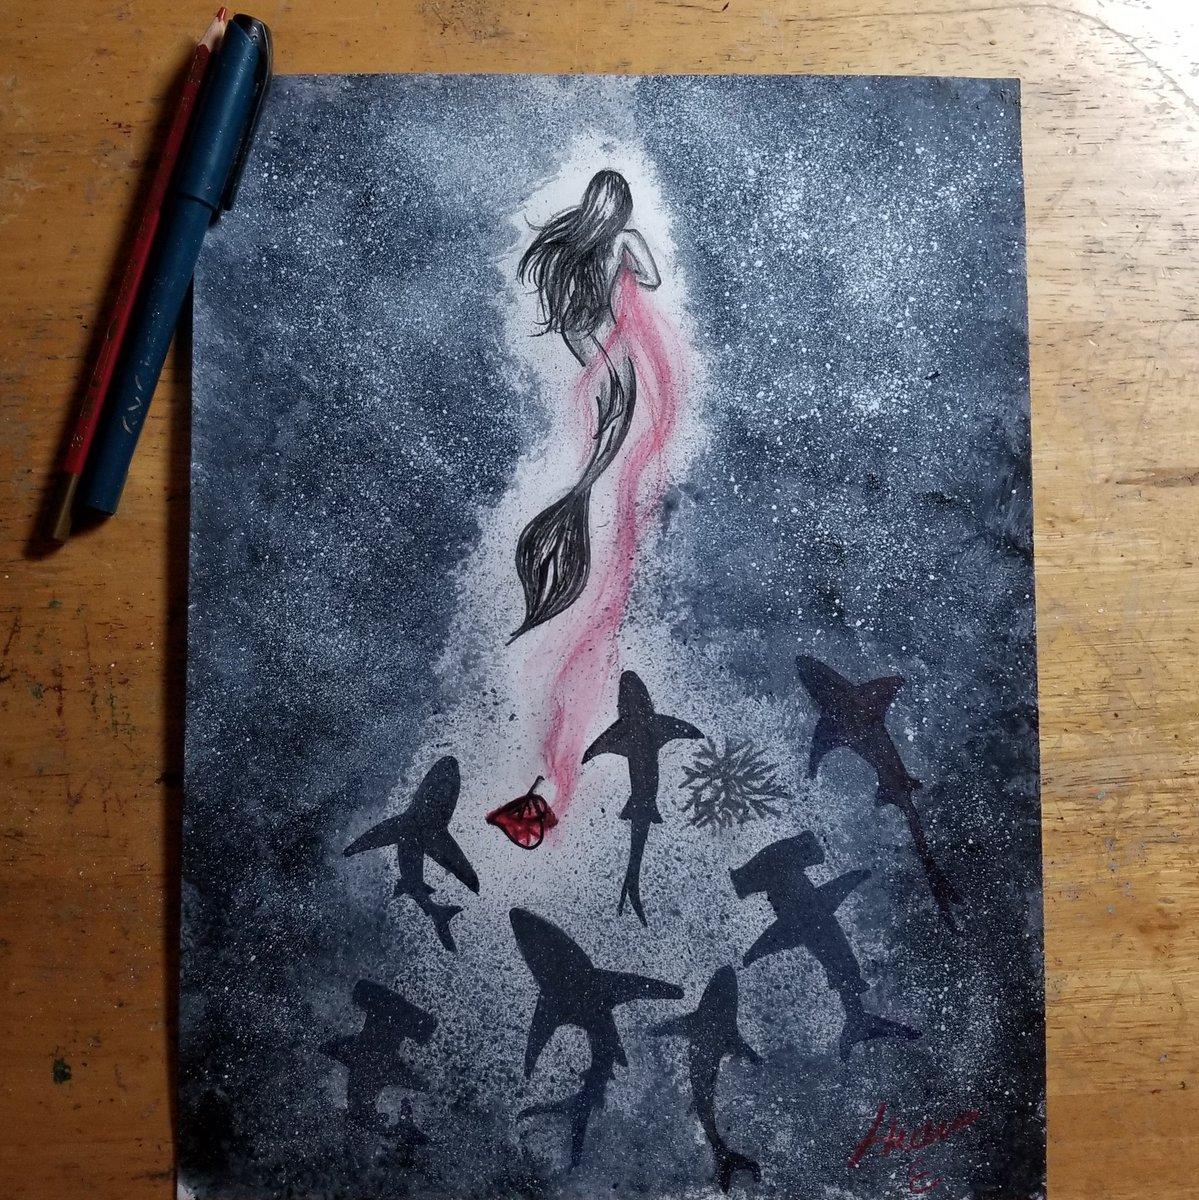 Attracting attention.  #warmupexercise  #sketchtherapy  #breakingaway #slippingaway #ptsd #ptsdtriggers #toyed #pencils #sketch #womenofart #dallas #womenartist #sirensoul #siren #brokenheart  #dallasartist #artjournal #artjournaling #thejourney #womansjourney pic.twitter.com/B9YdLqJrUf